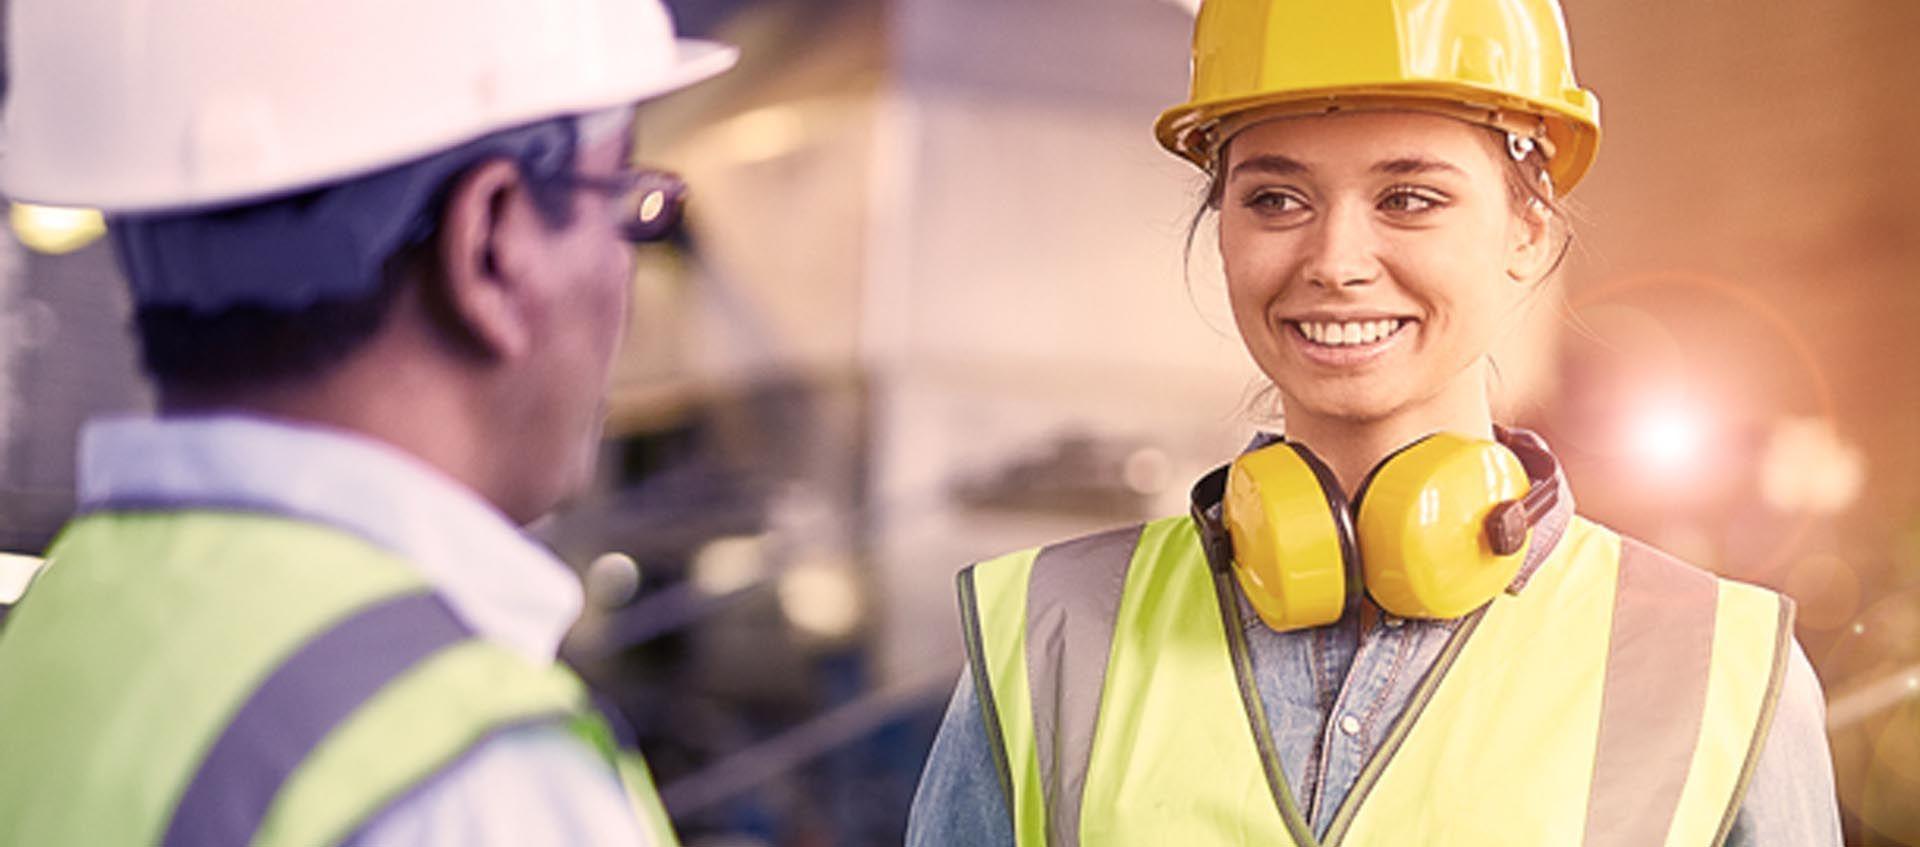 Tecnico segurança do trabalho on line